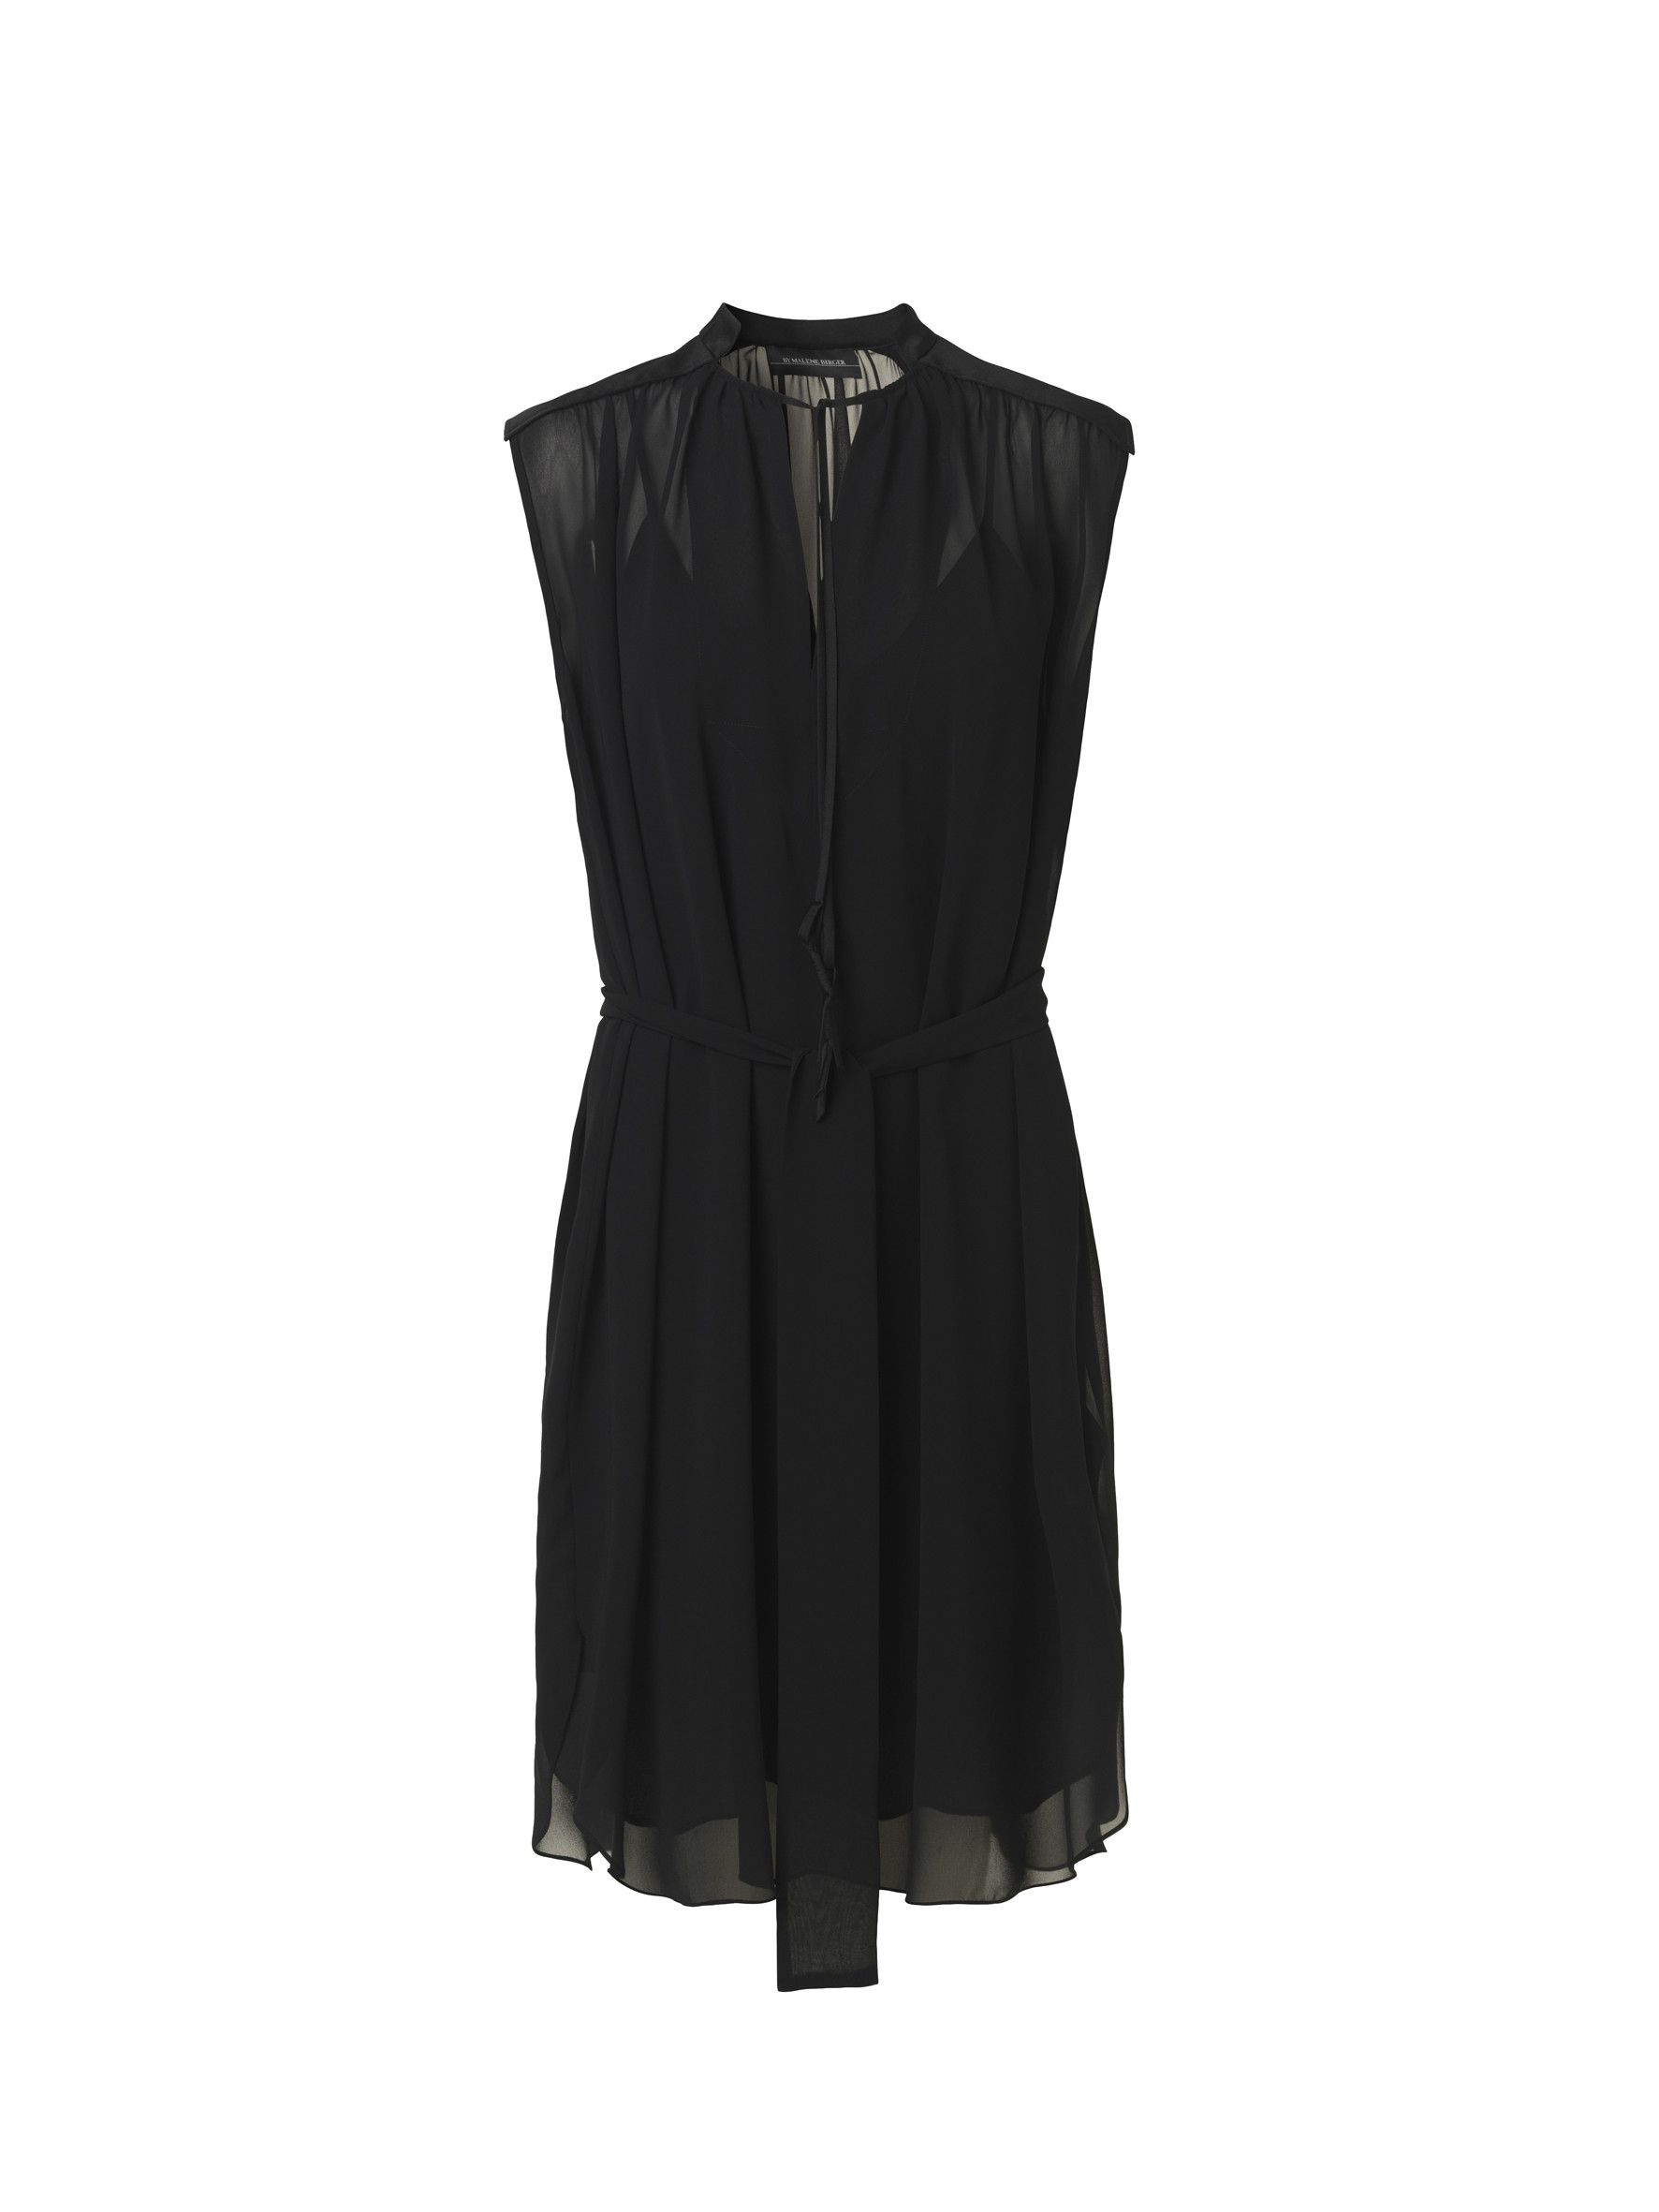 7b1a2a5d98 Bolisma dress By Malene Birger Crafted from flowing chiffon